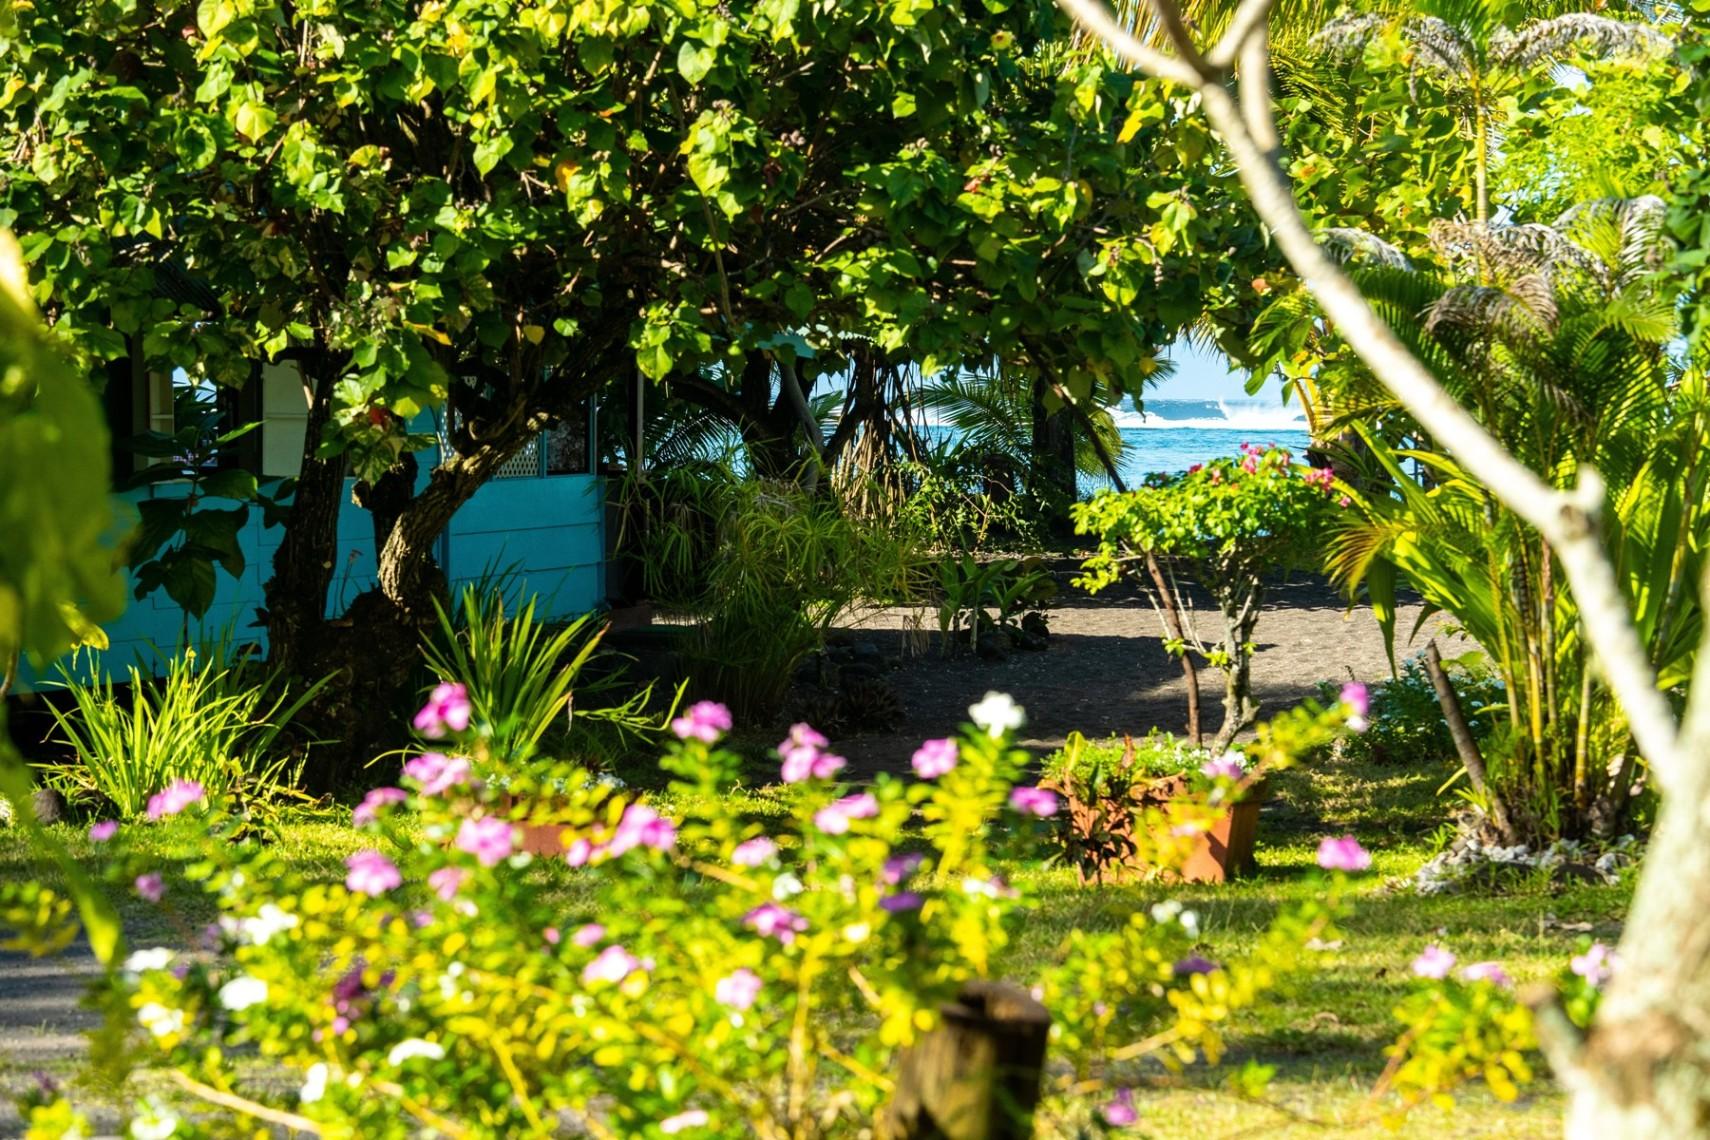 https://tahititourisme.es/wp-content/uploads/2019/08/copie-tahiti-tourisme-800ko-1.jpg